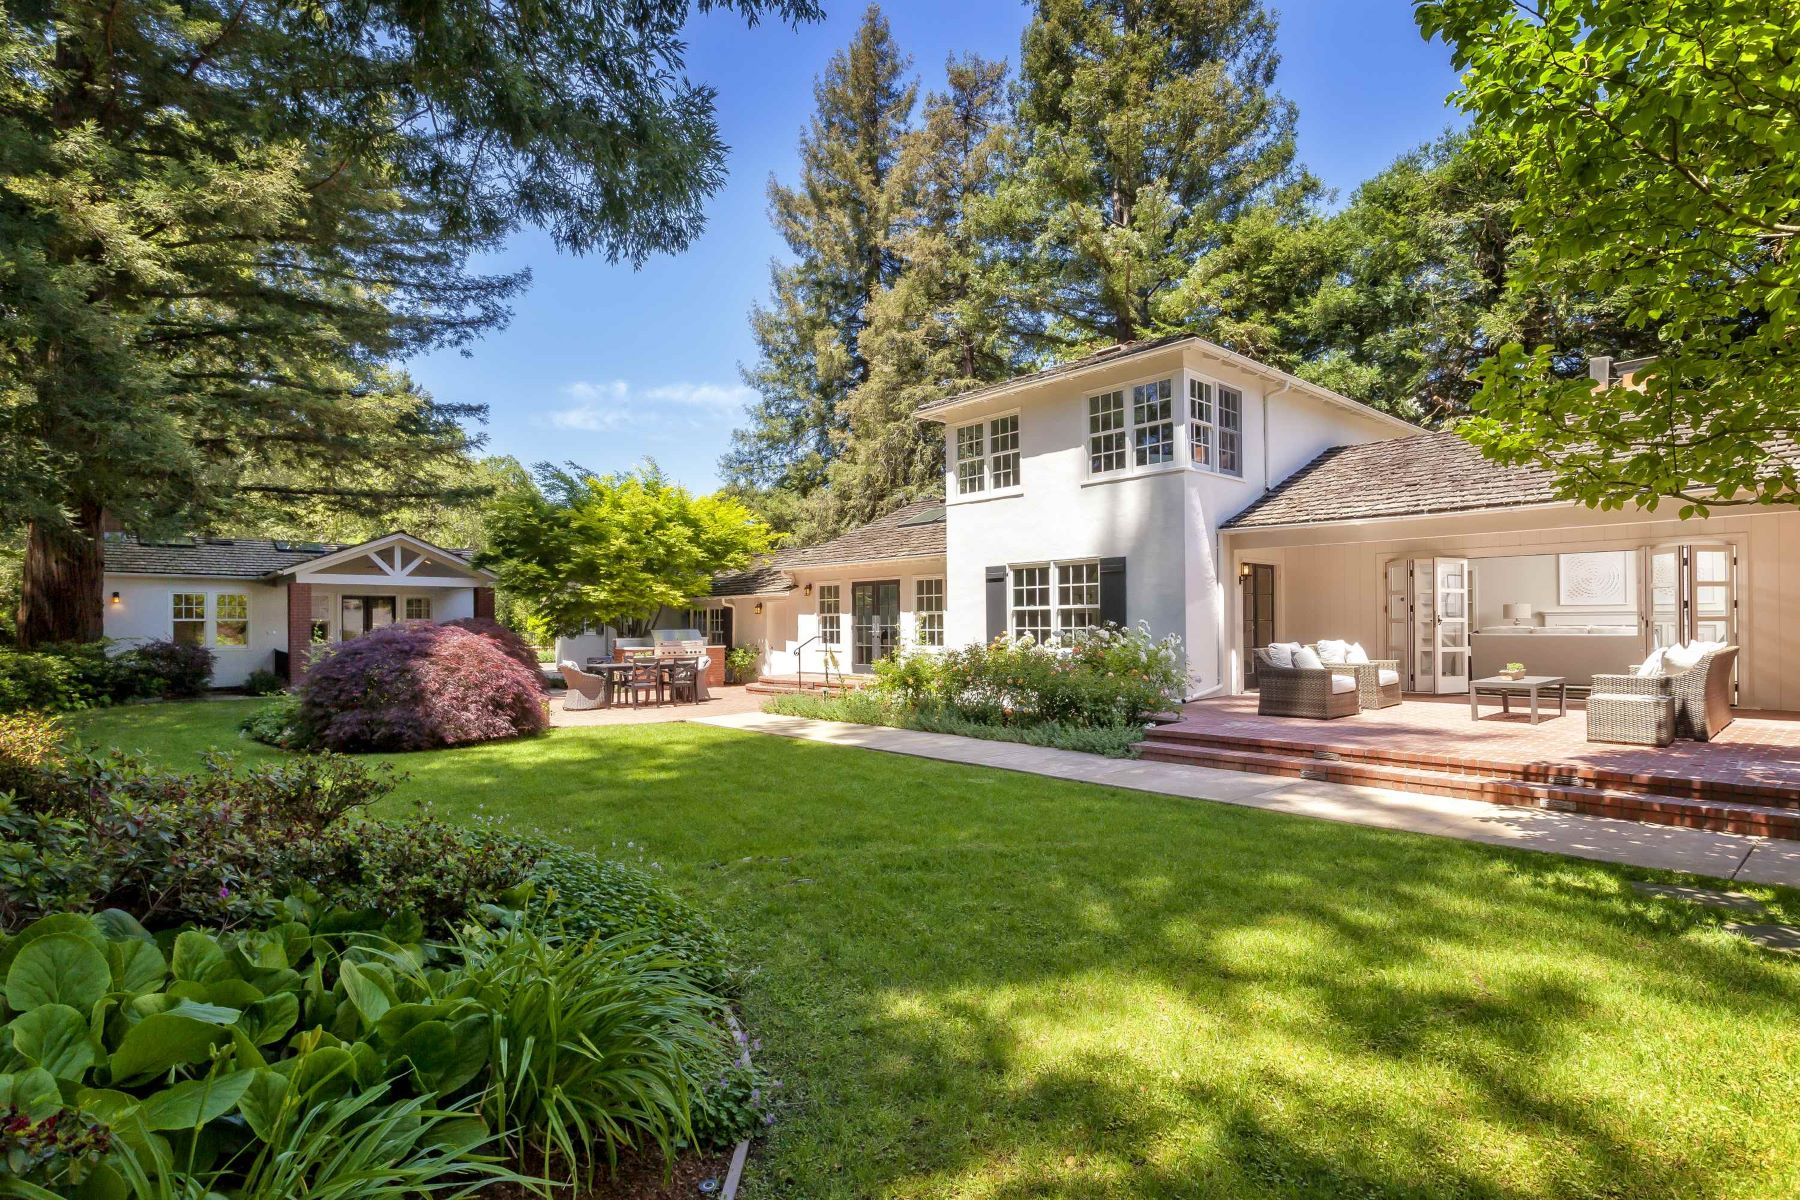 Single Family Homes for Active at 184 Tuscaloosa Ave Atherton, California 94027 United States